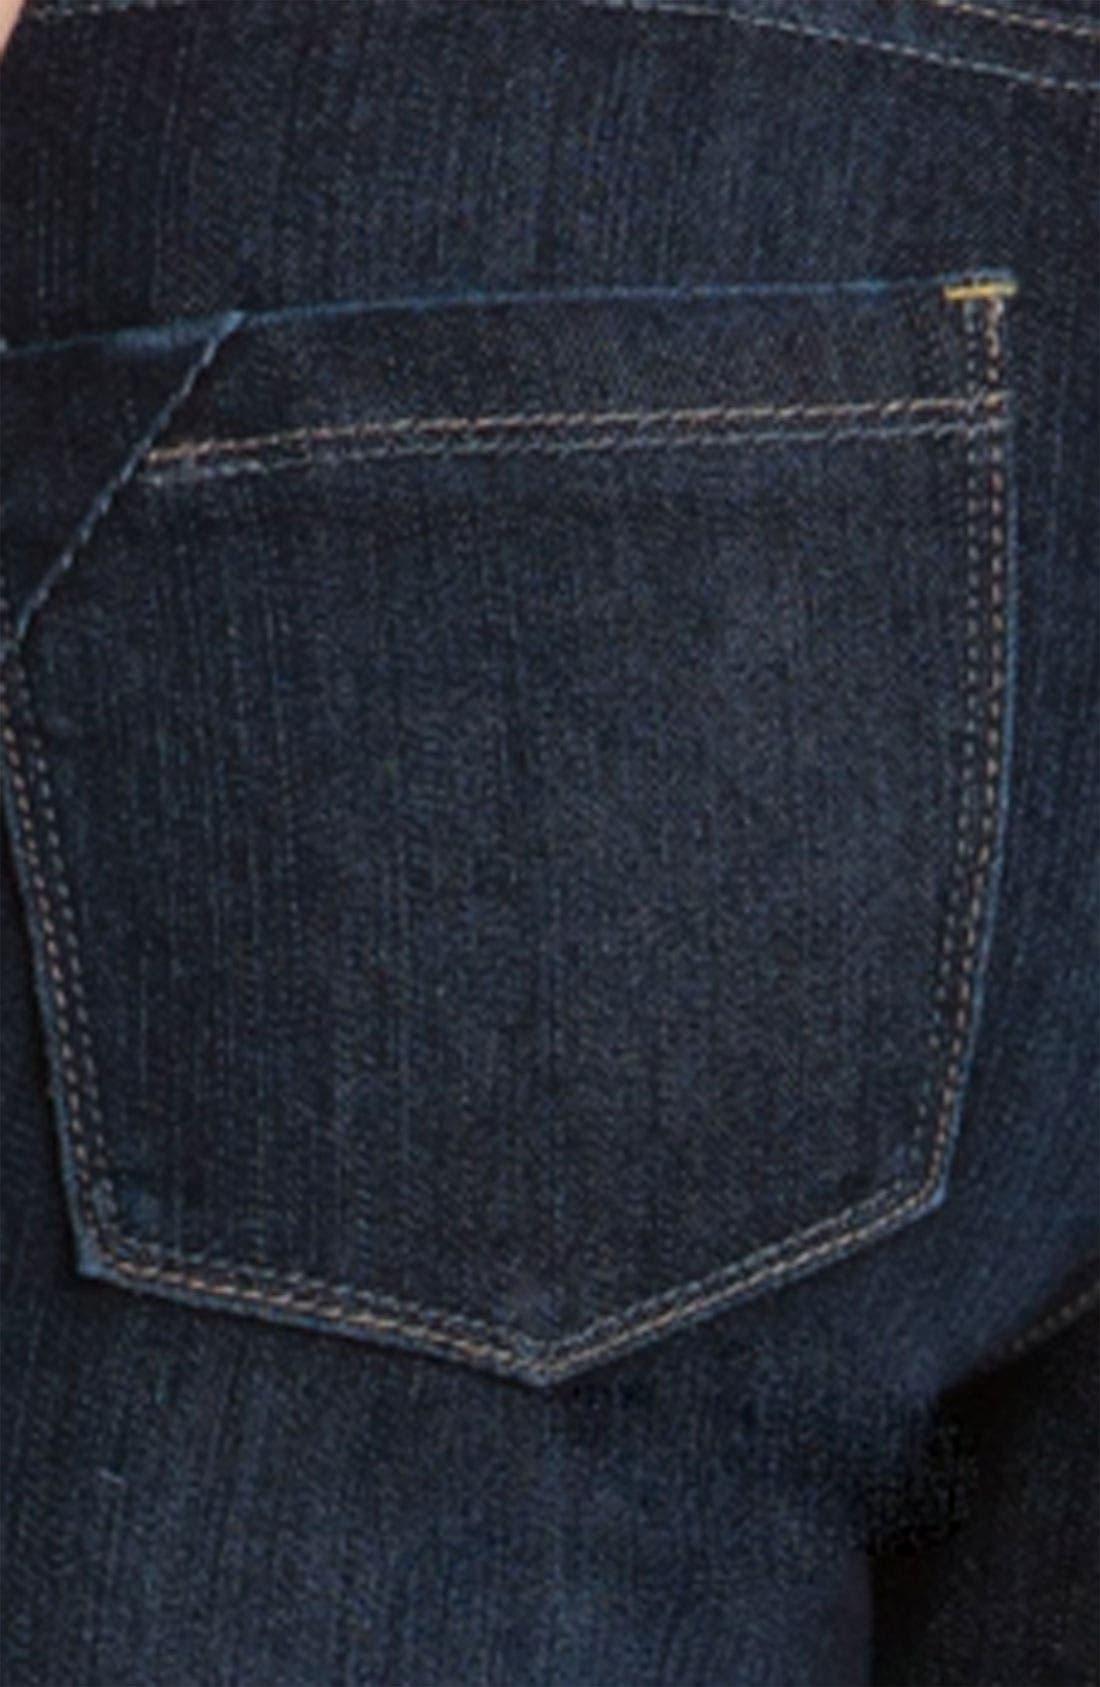 Alternate Image 3  - Jag Jeans 'New Jane' Slim Leg Jeans (Petite)